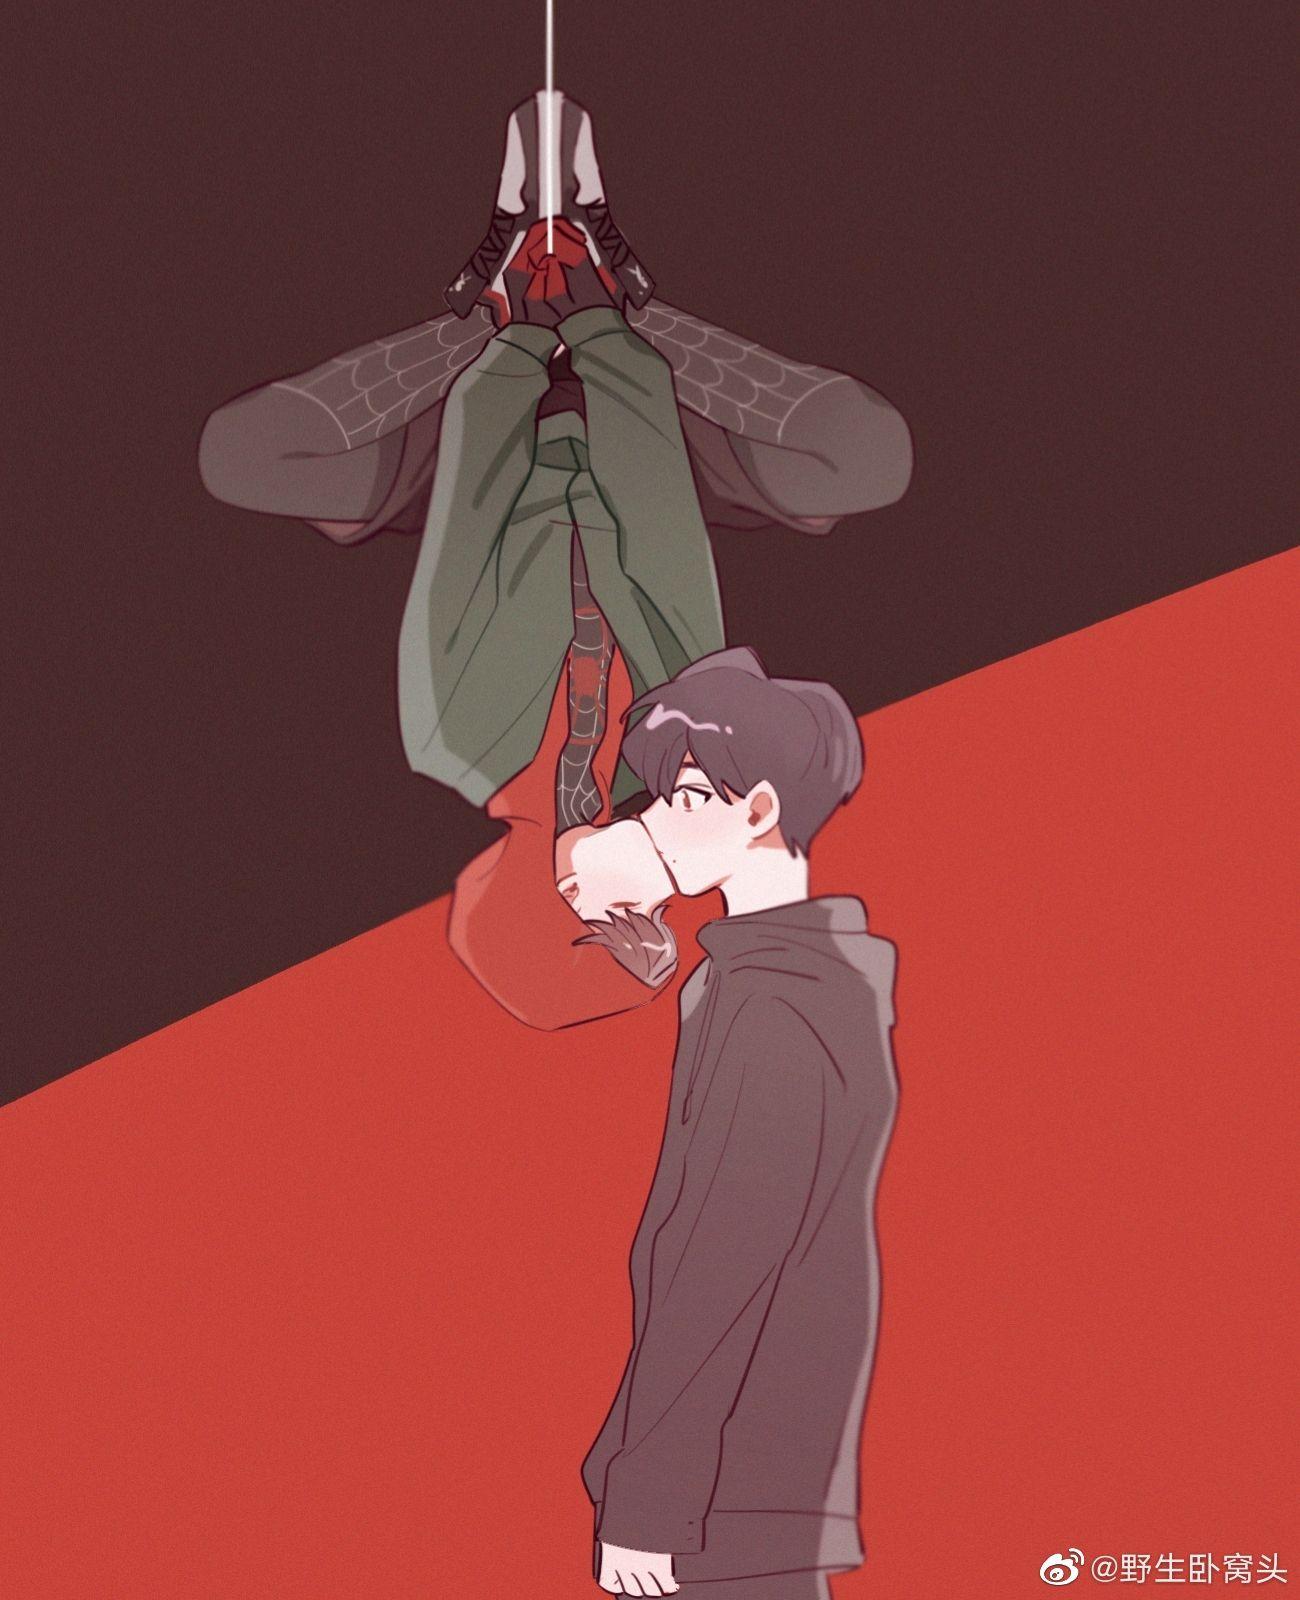 Pin by Orca Dreamer on BJYX同人 绘画参考 in 2020 Anime, Chibi, Art